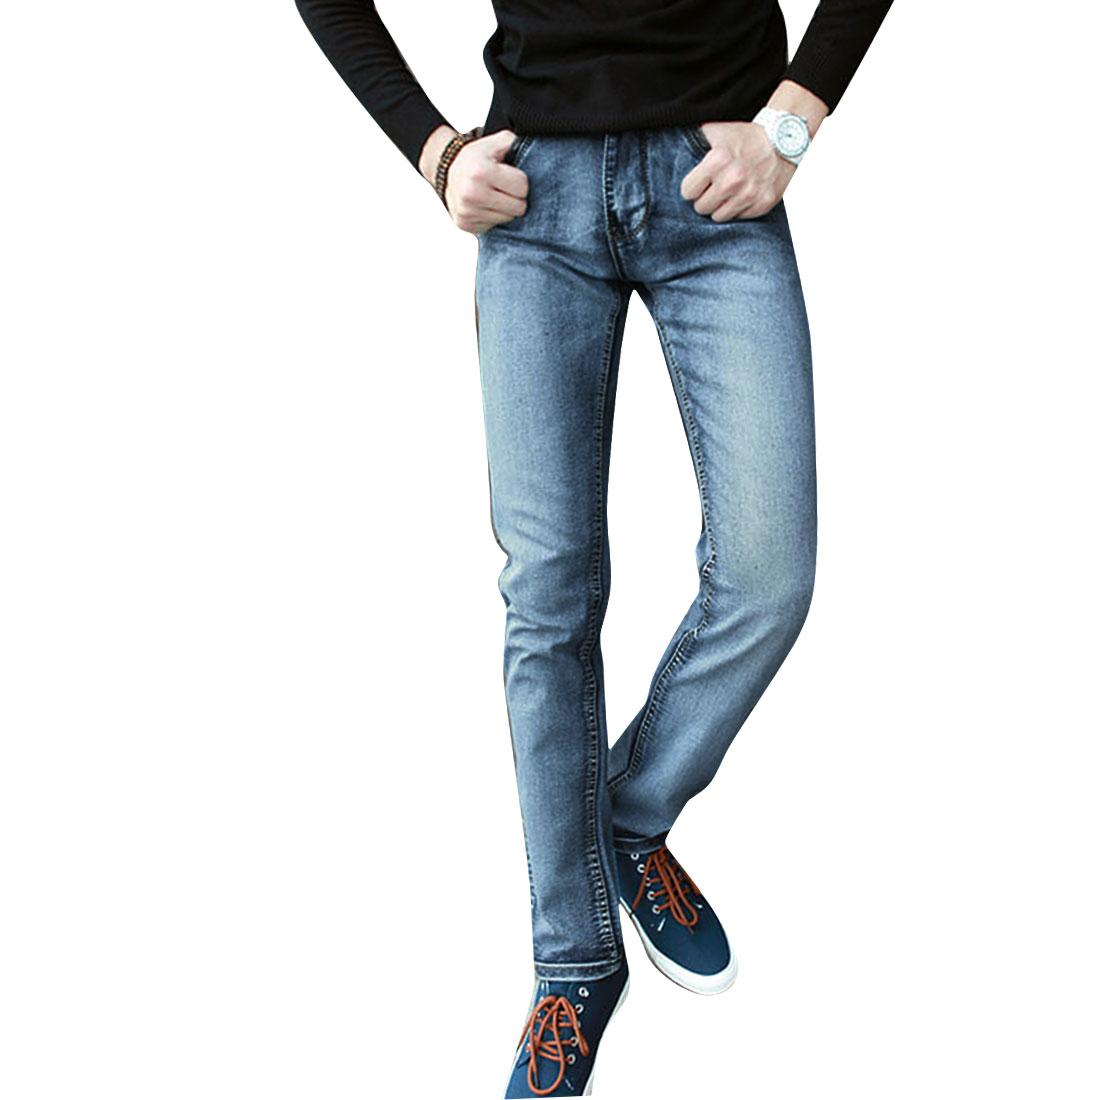 Men Zip Up One Button Up Straight Legs Denim Pants Pale Blue W32